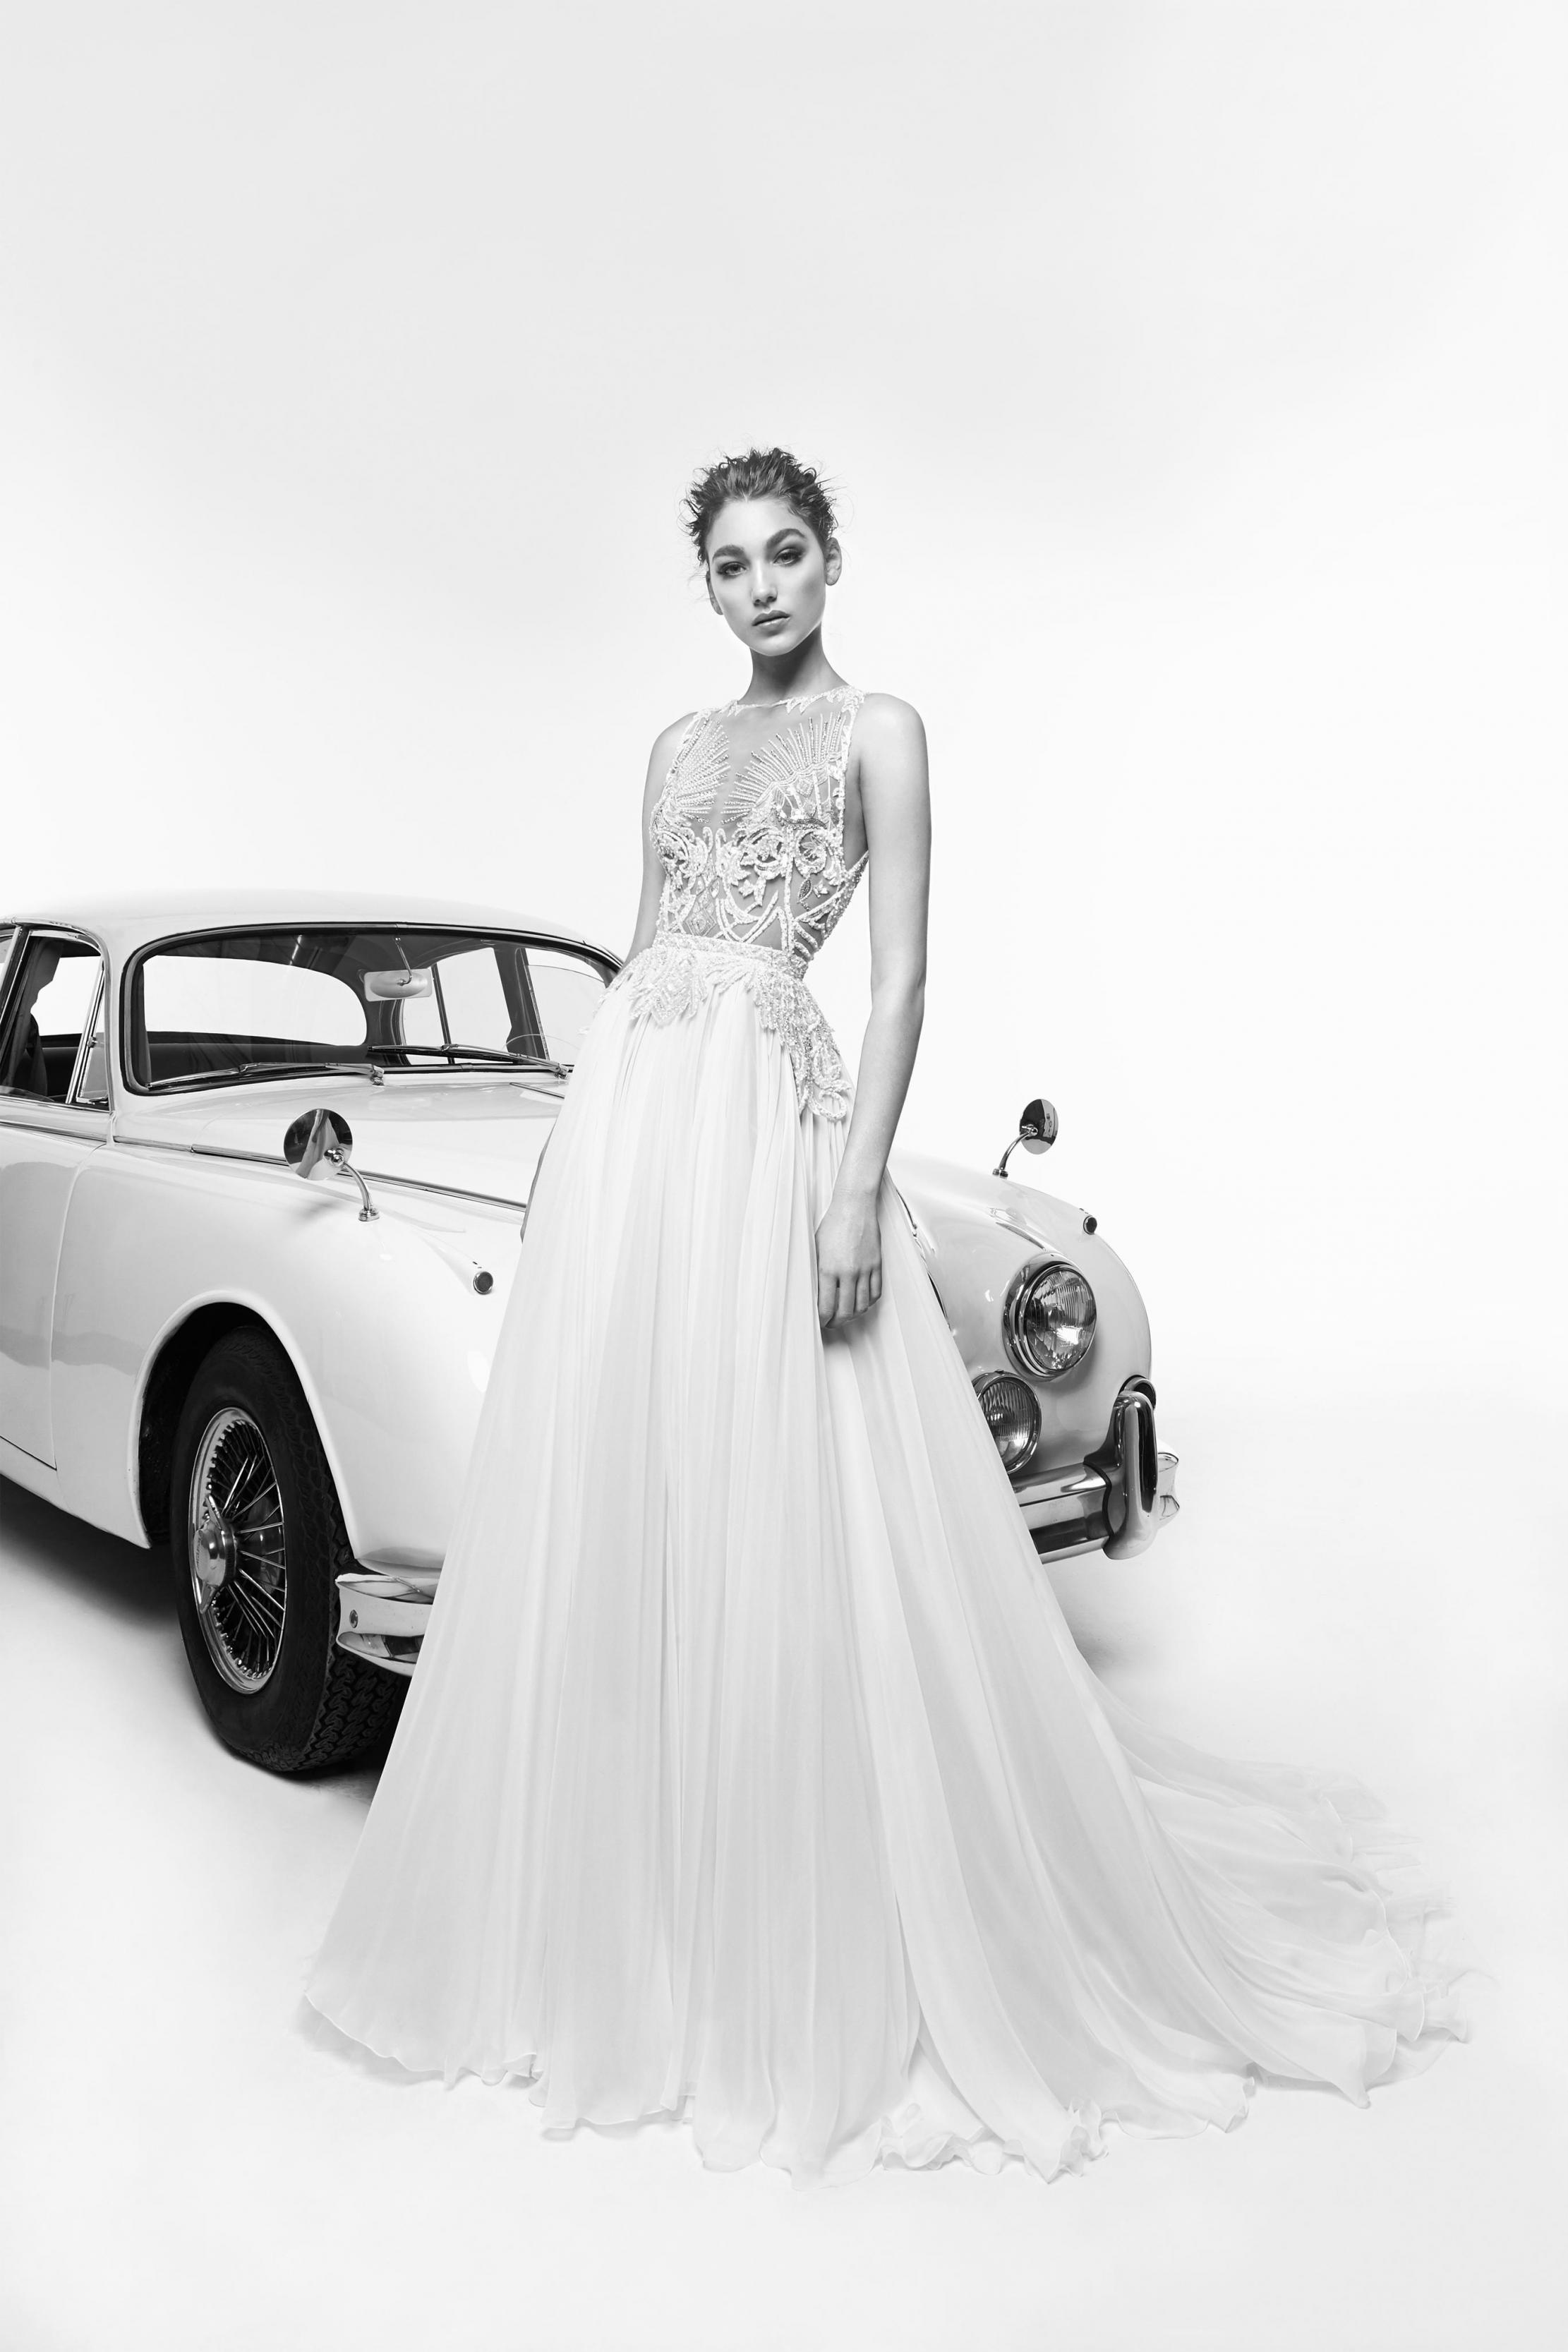 بالصور فساتين زفاف زهير مراد 2019 , فساتين زفاف زهير مراد واجمد فساتين 5814 3